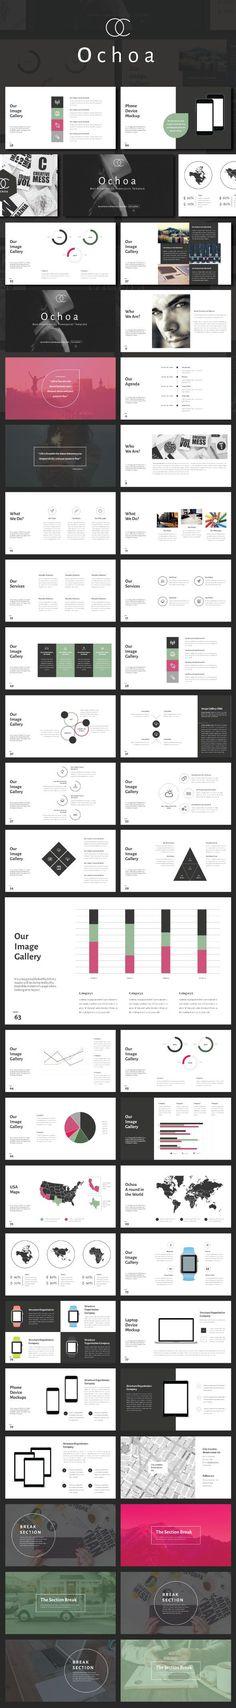 Koika Powerpoint Presentation Template Powerpoint presentation - presentation template